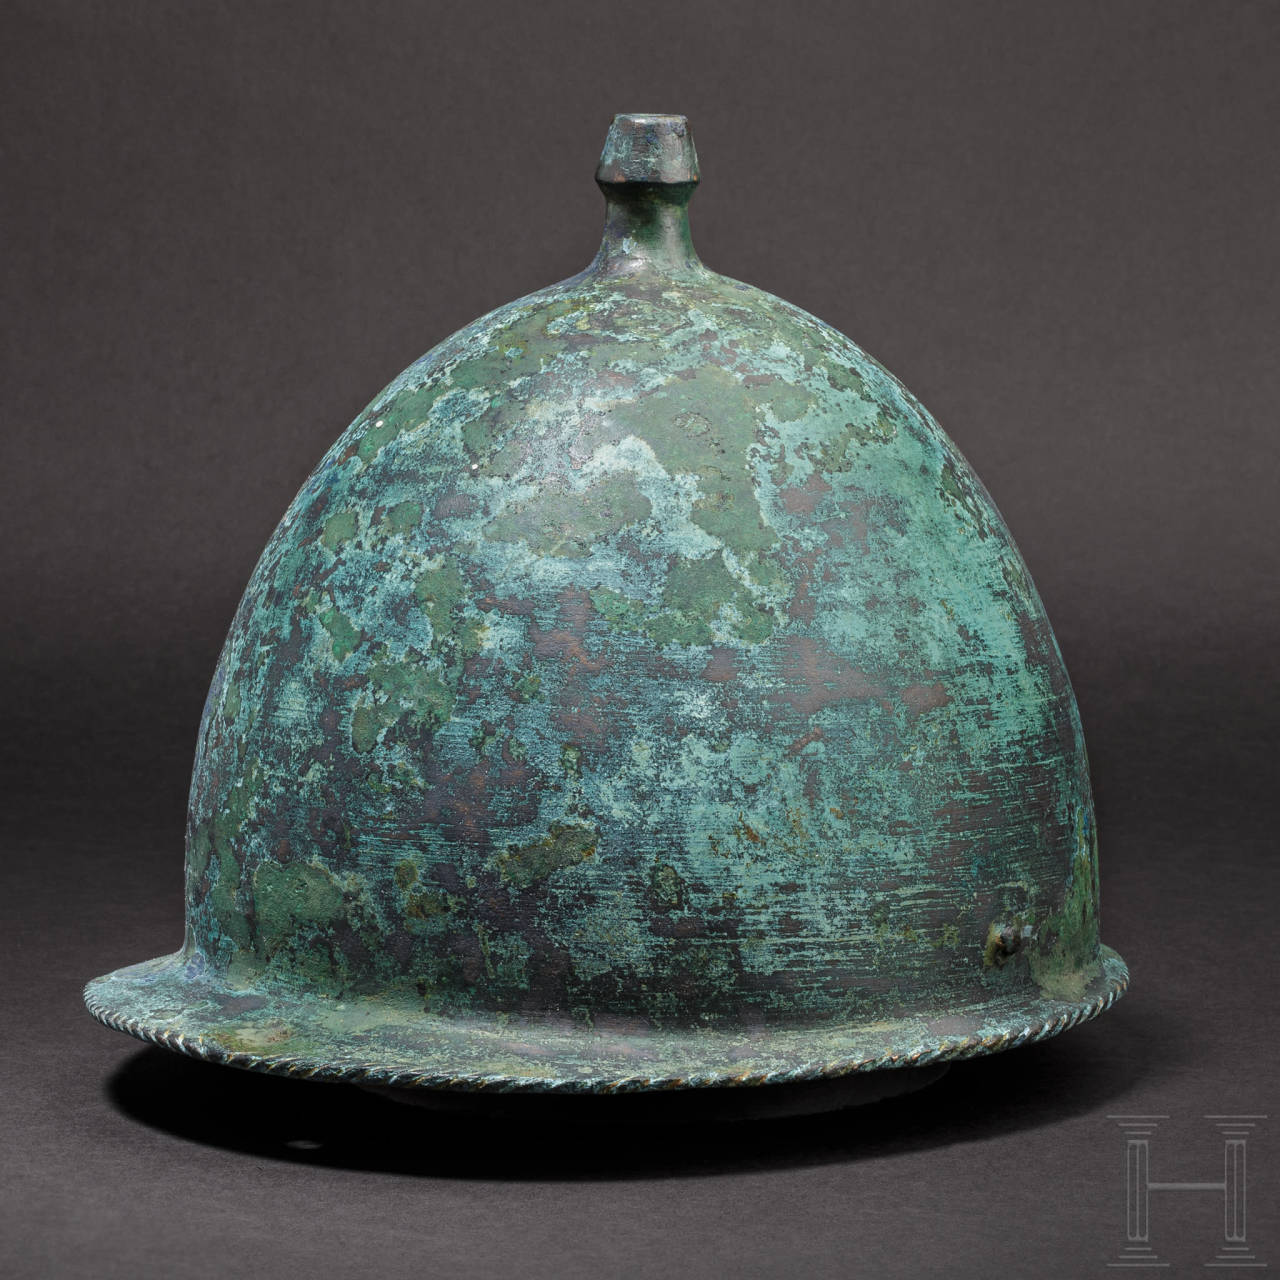 A Roman bronze helmet of the Buggenum type, 1st century B.C.